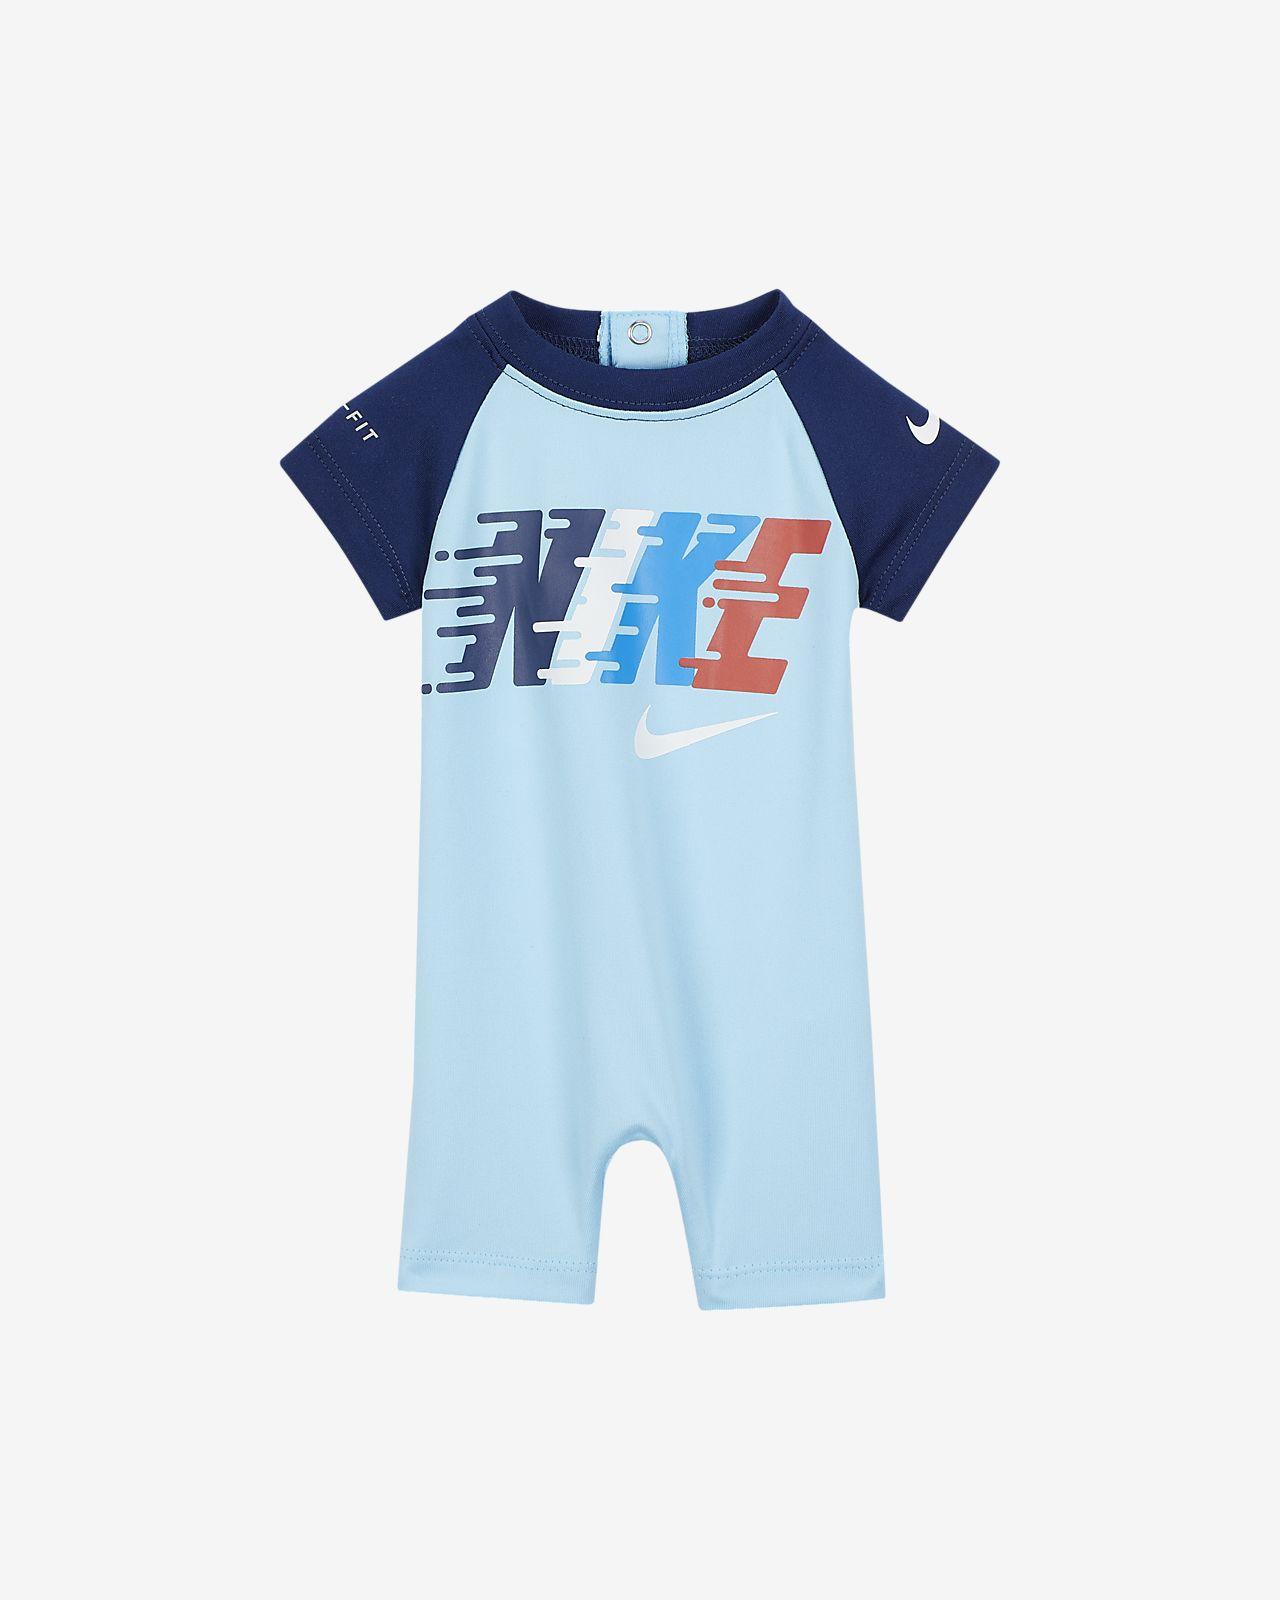 643b39c06 Nike Dri-FIT Baby (0-9M) Romper. Nike.com